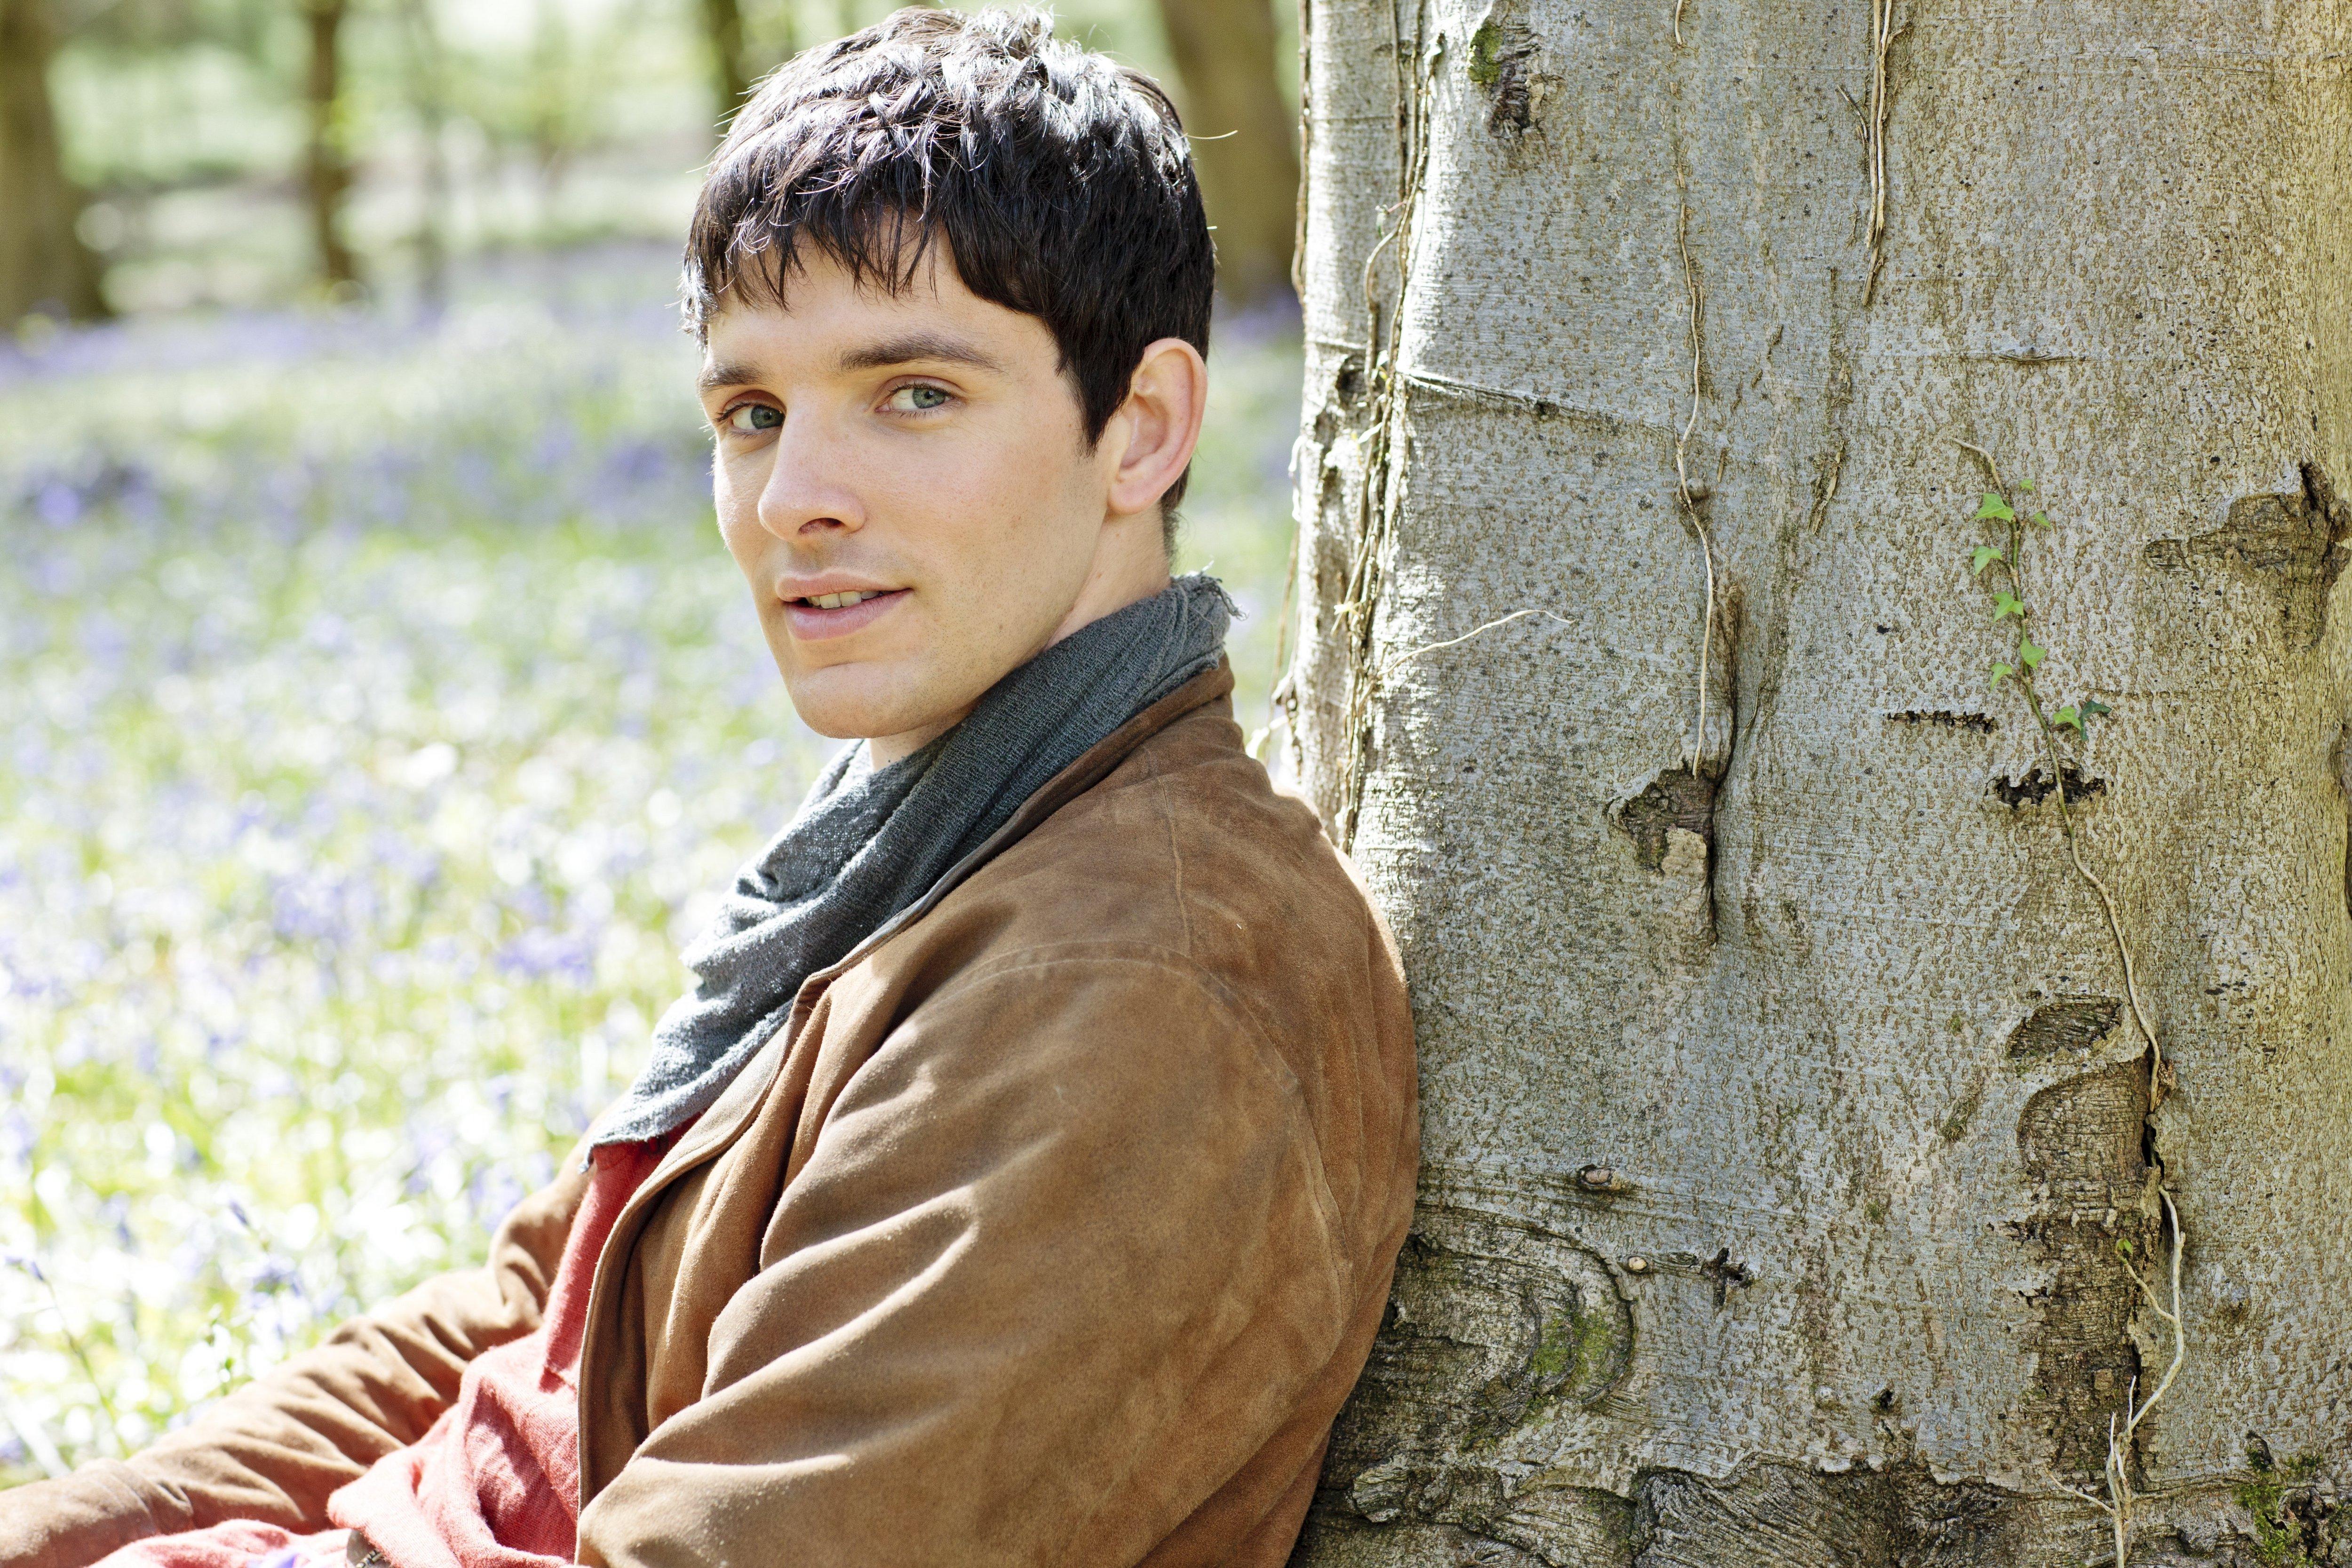 Season 5 Merlin On Bbc Photo 32373771 Fanpop